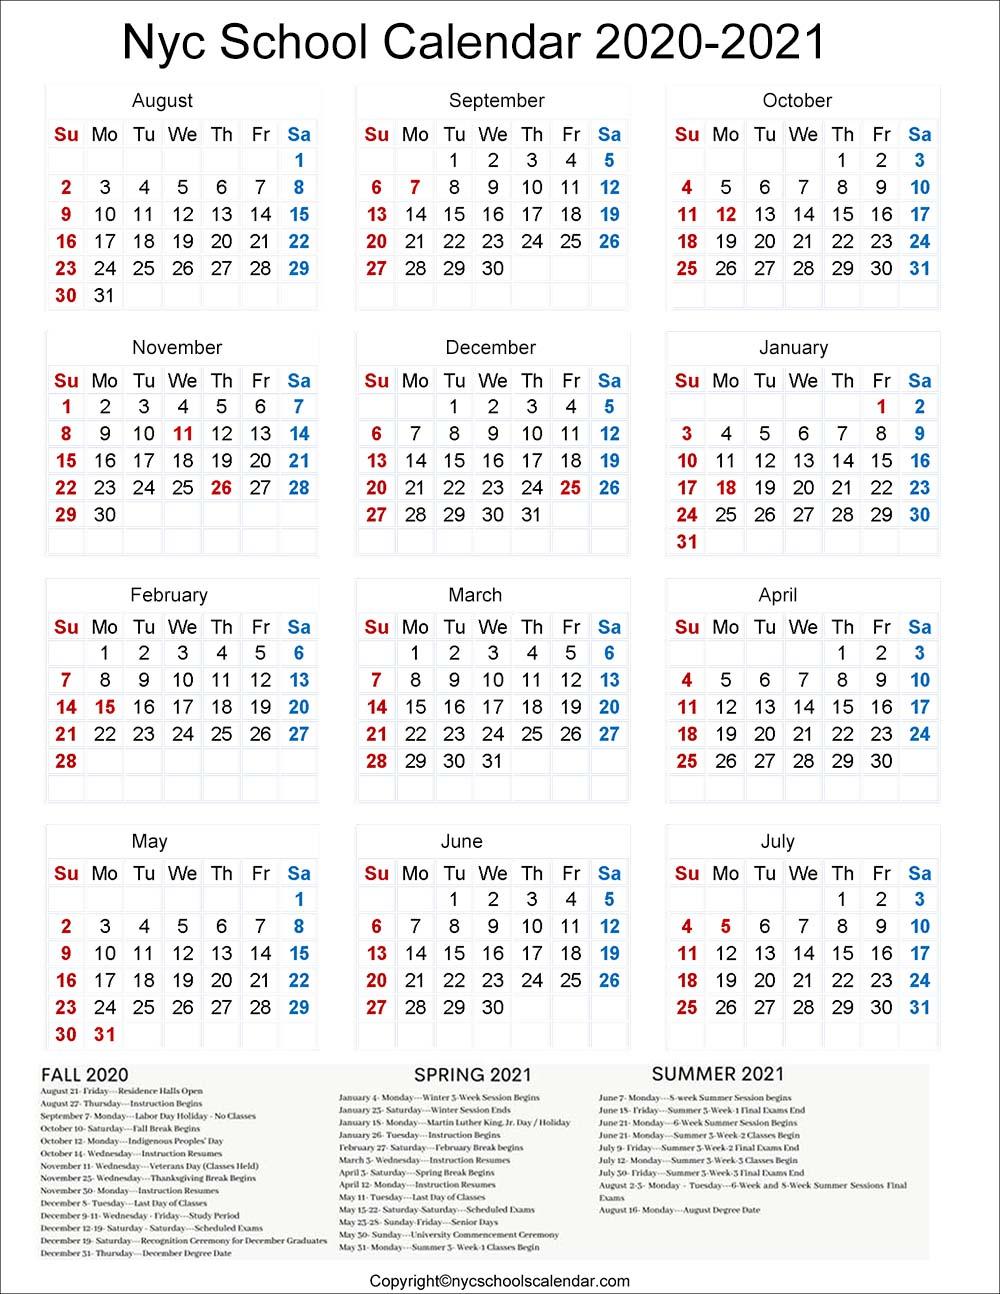 NYC School Term Dates 2020